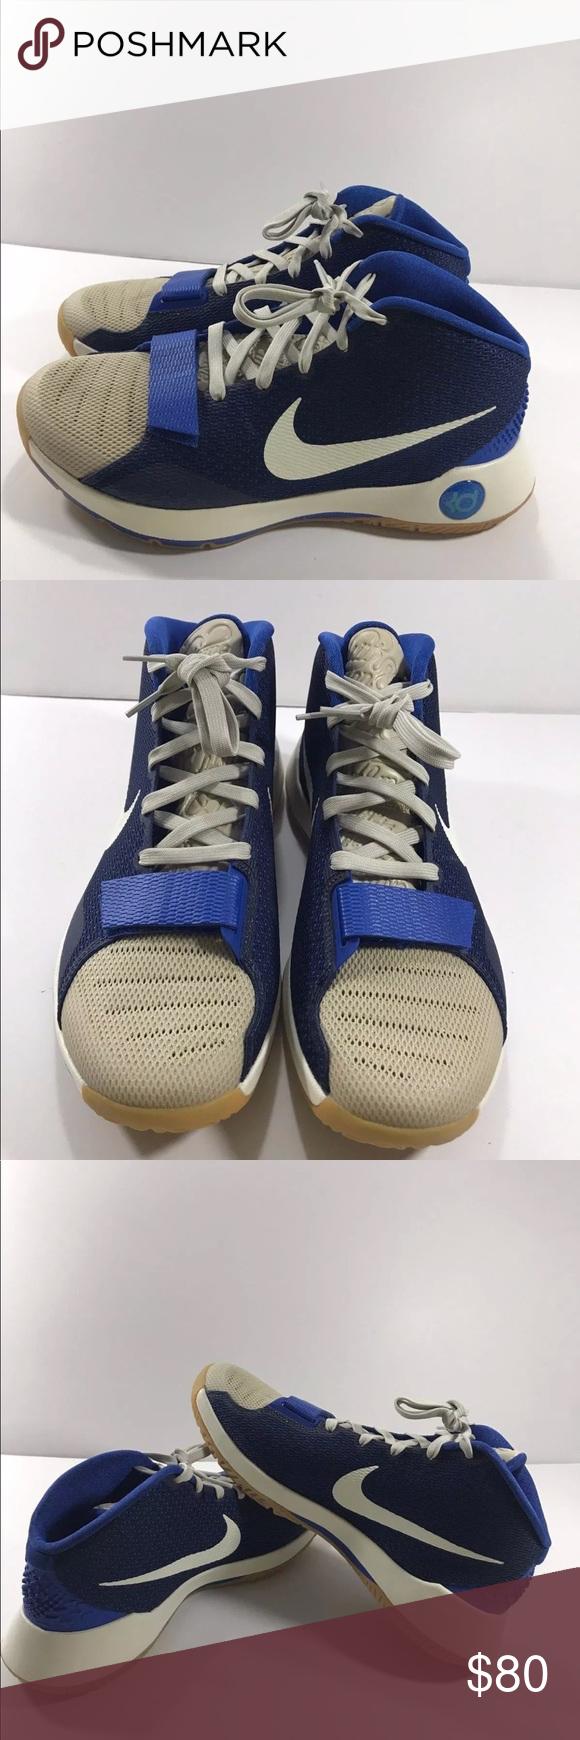 be97444ca95 NIKE Men s KD TREY 5 III LMTD Basketball Shoes NIKE Men s KD TREY 5 III  LMTD Basketball Shoes BRAND  Nike MODEL  Nike KD TREY 5 III…